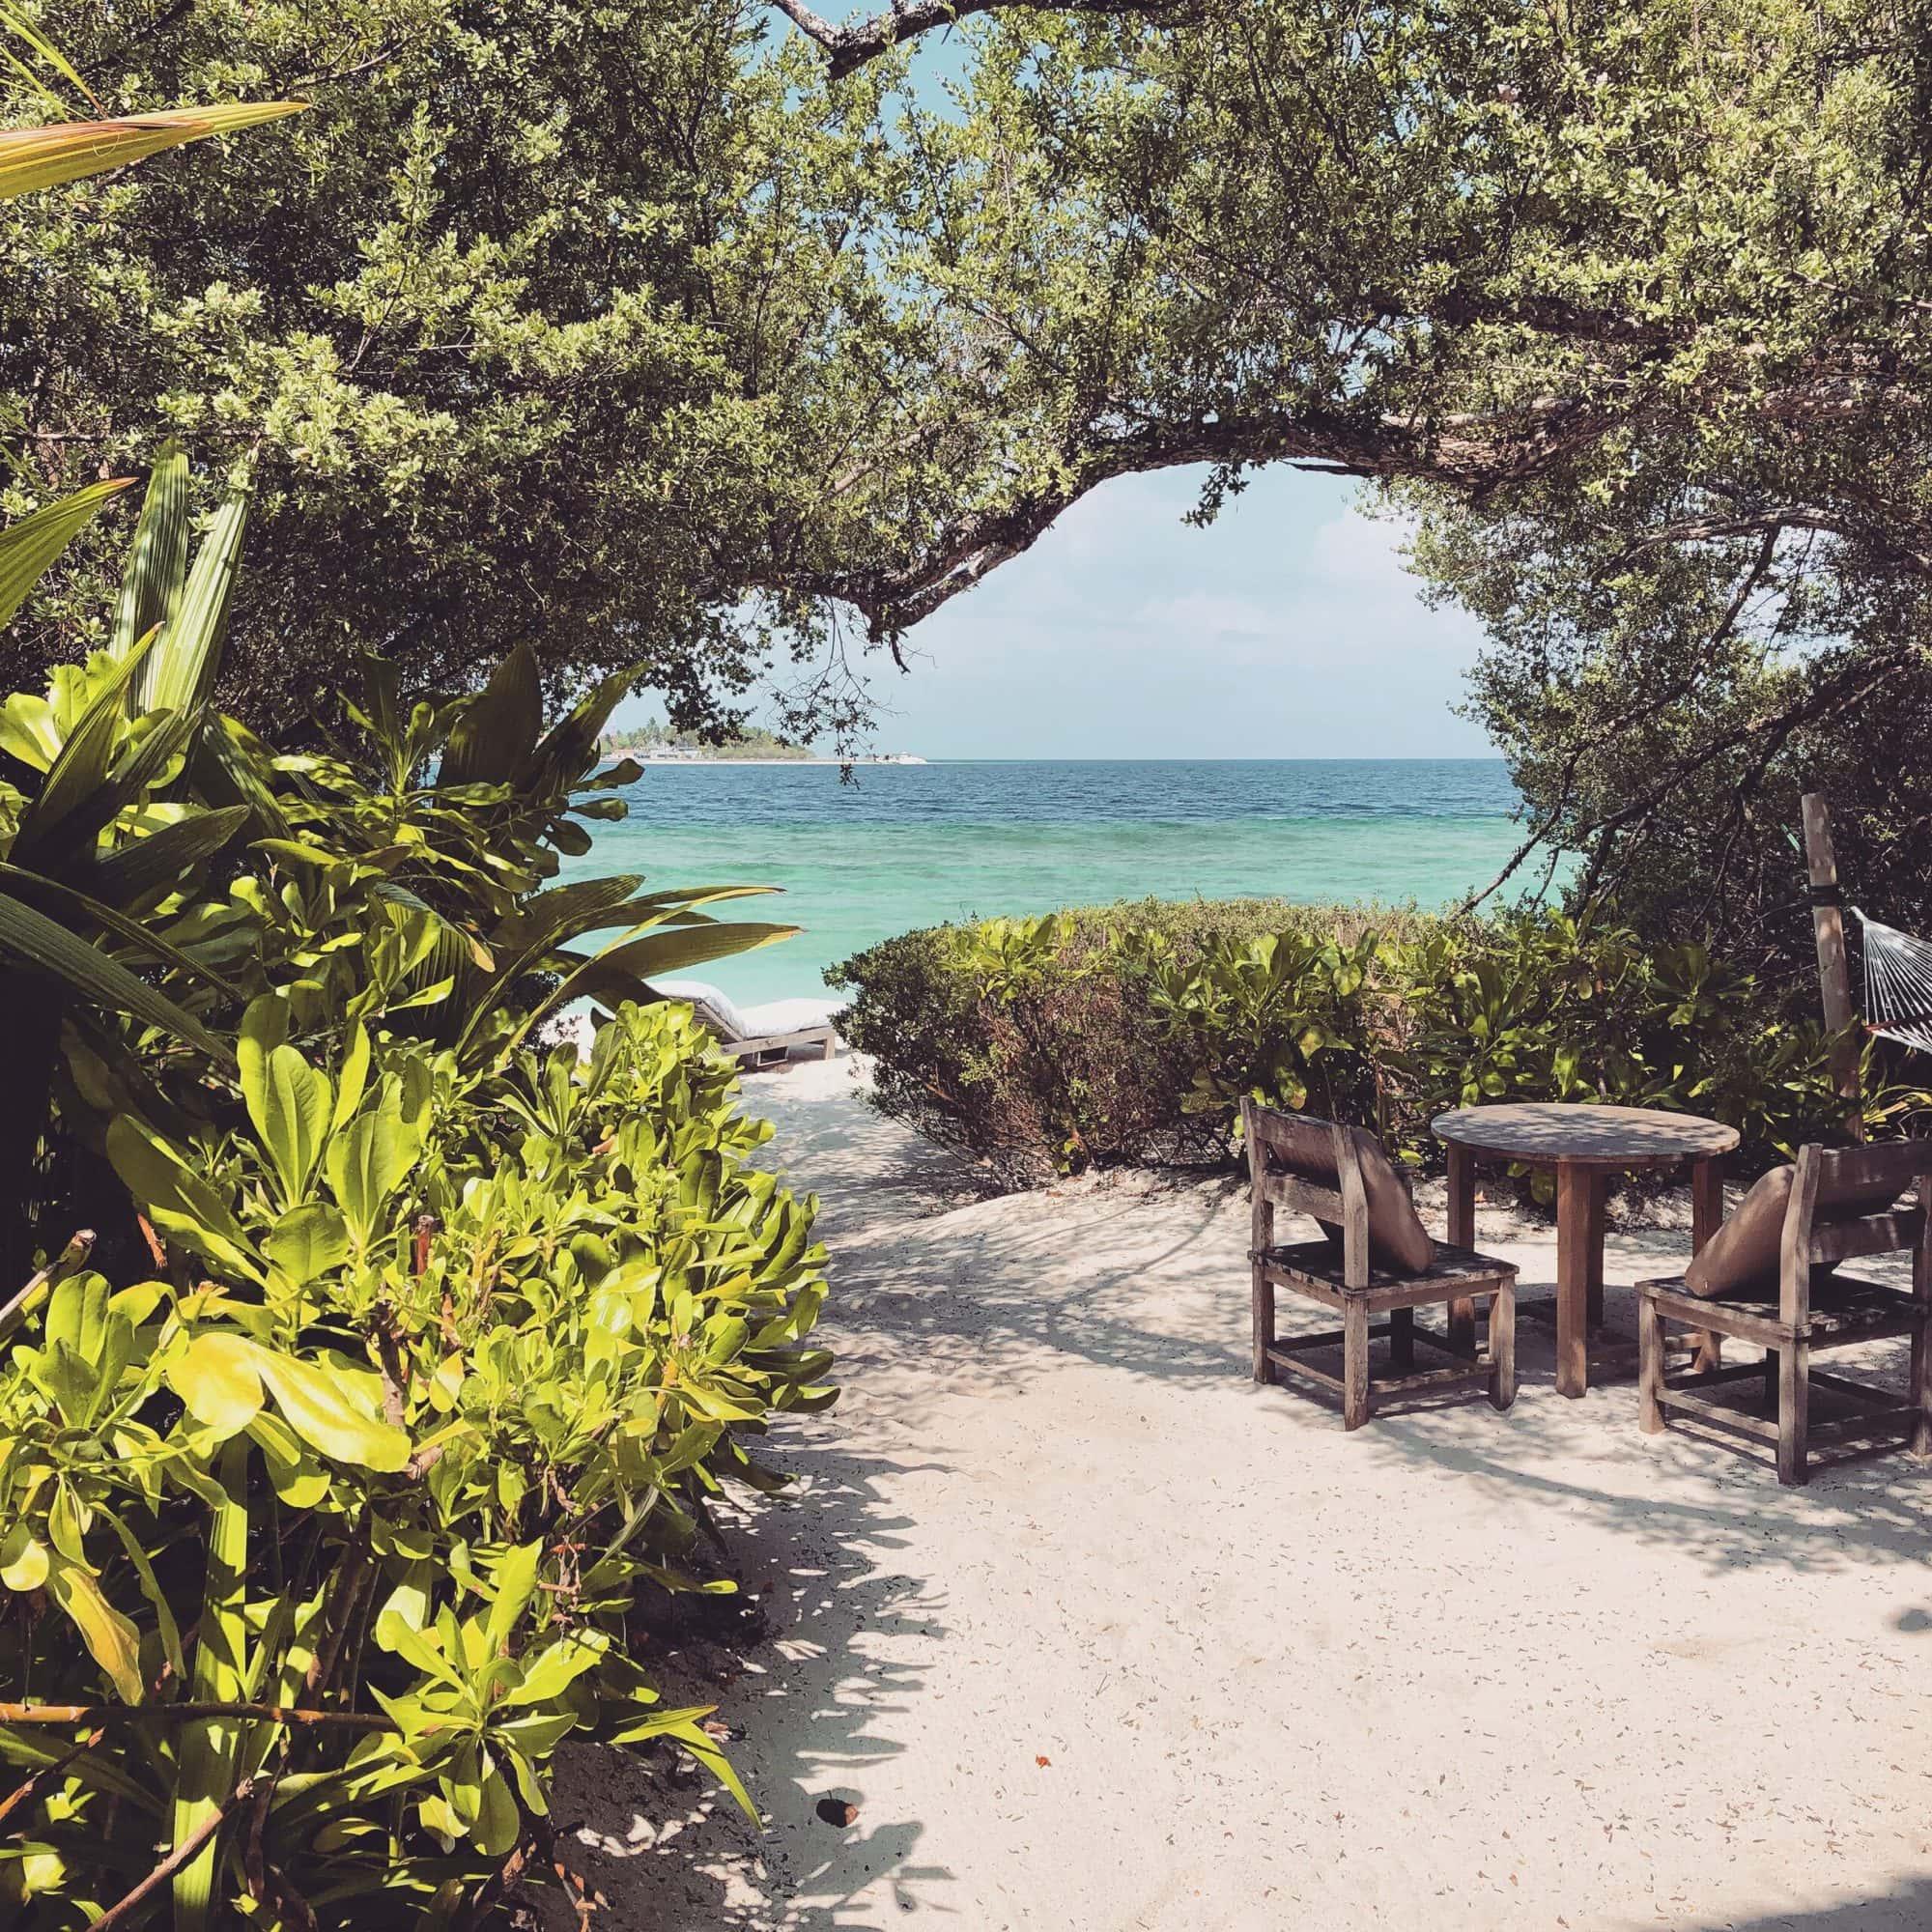 Your own private beach at Soneva Fushi